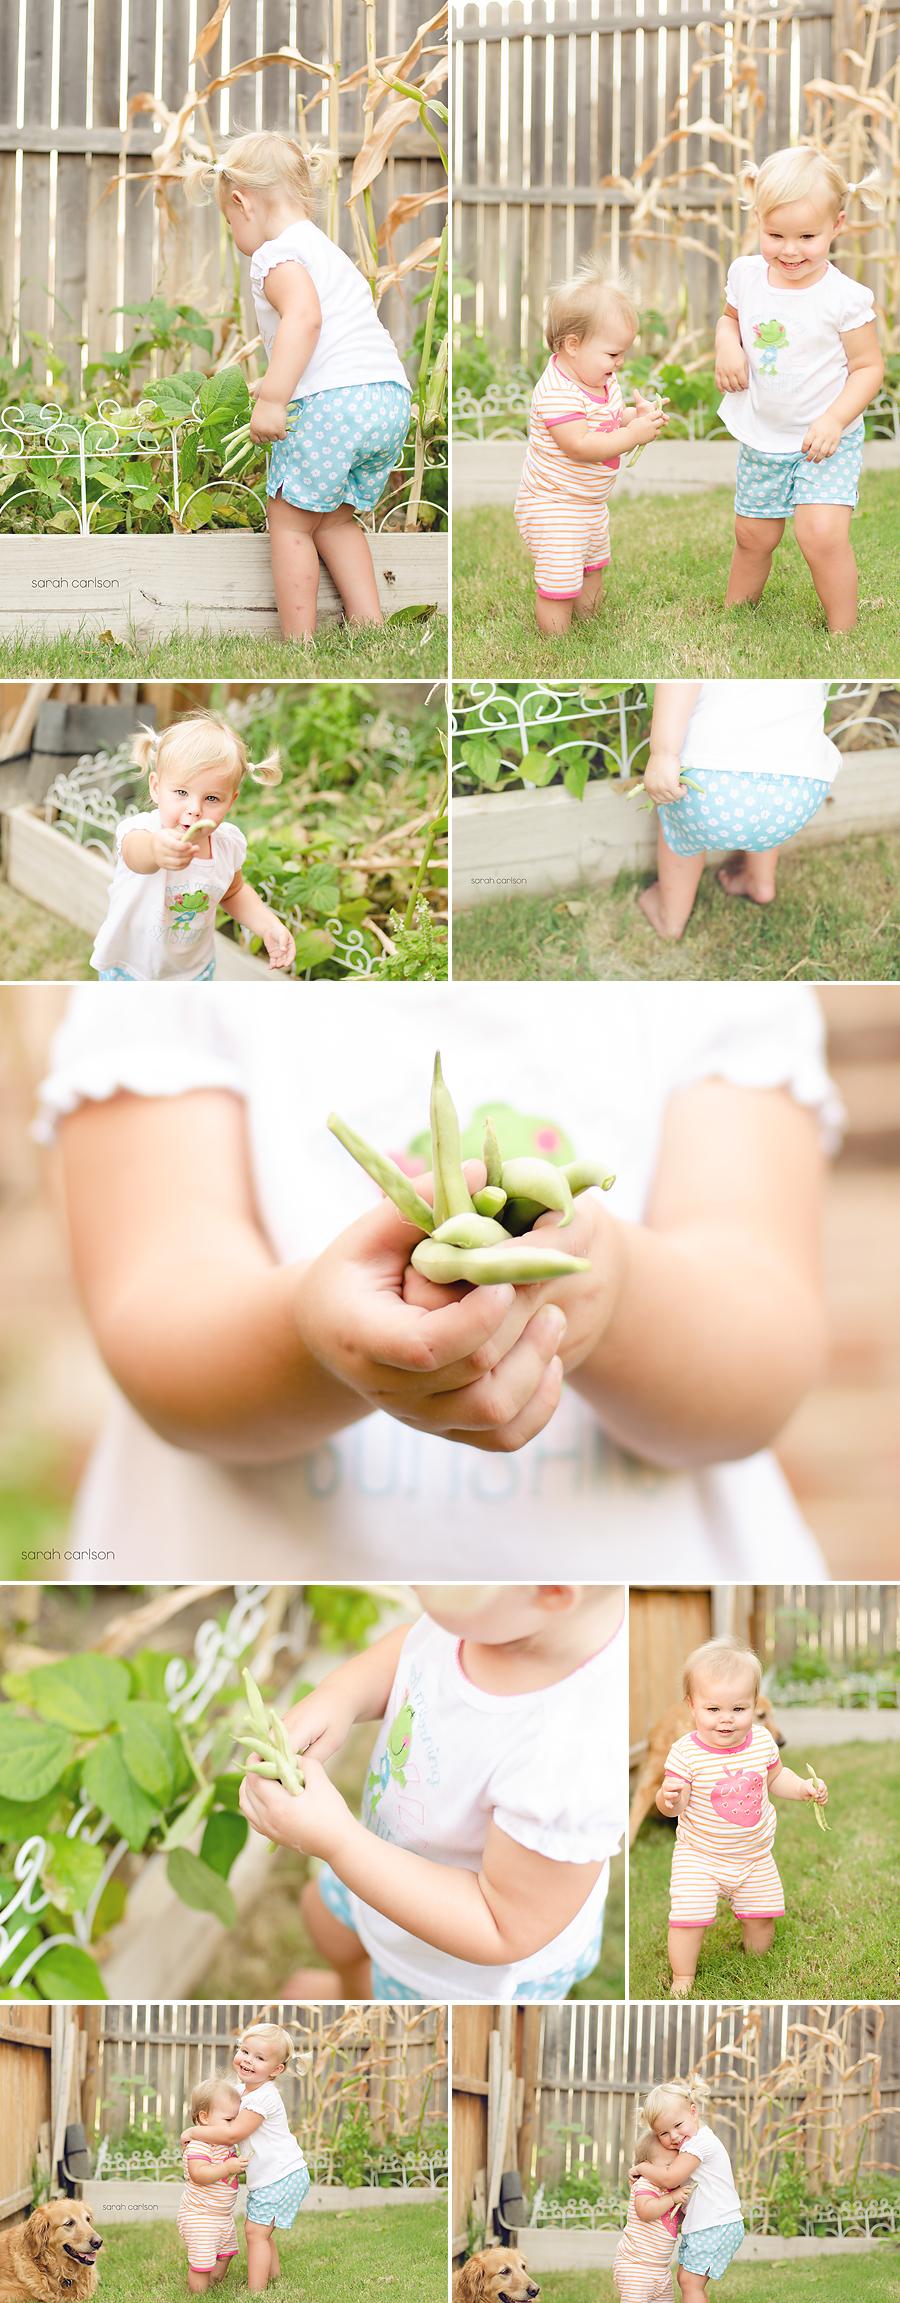 picking beans storyboard